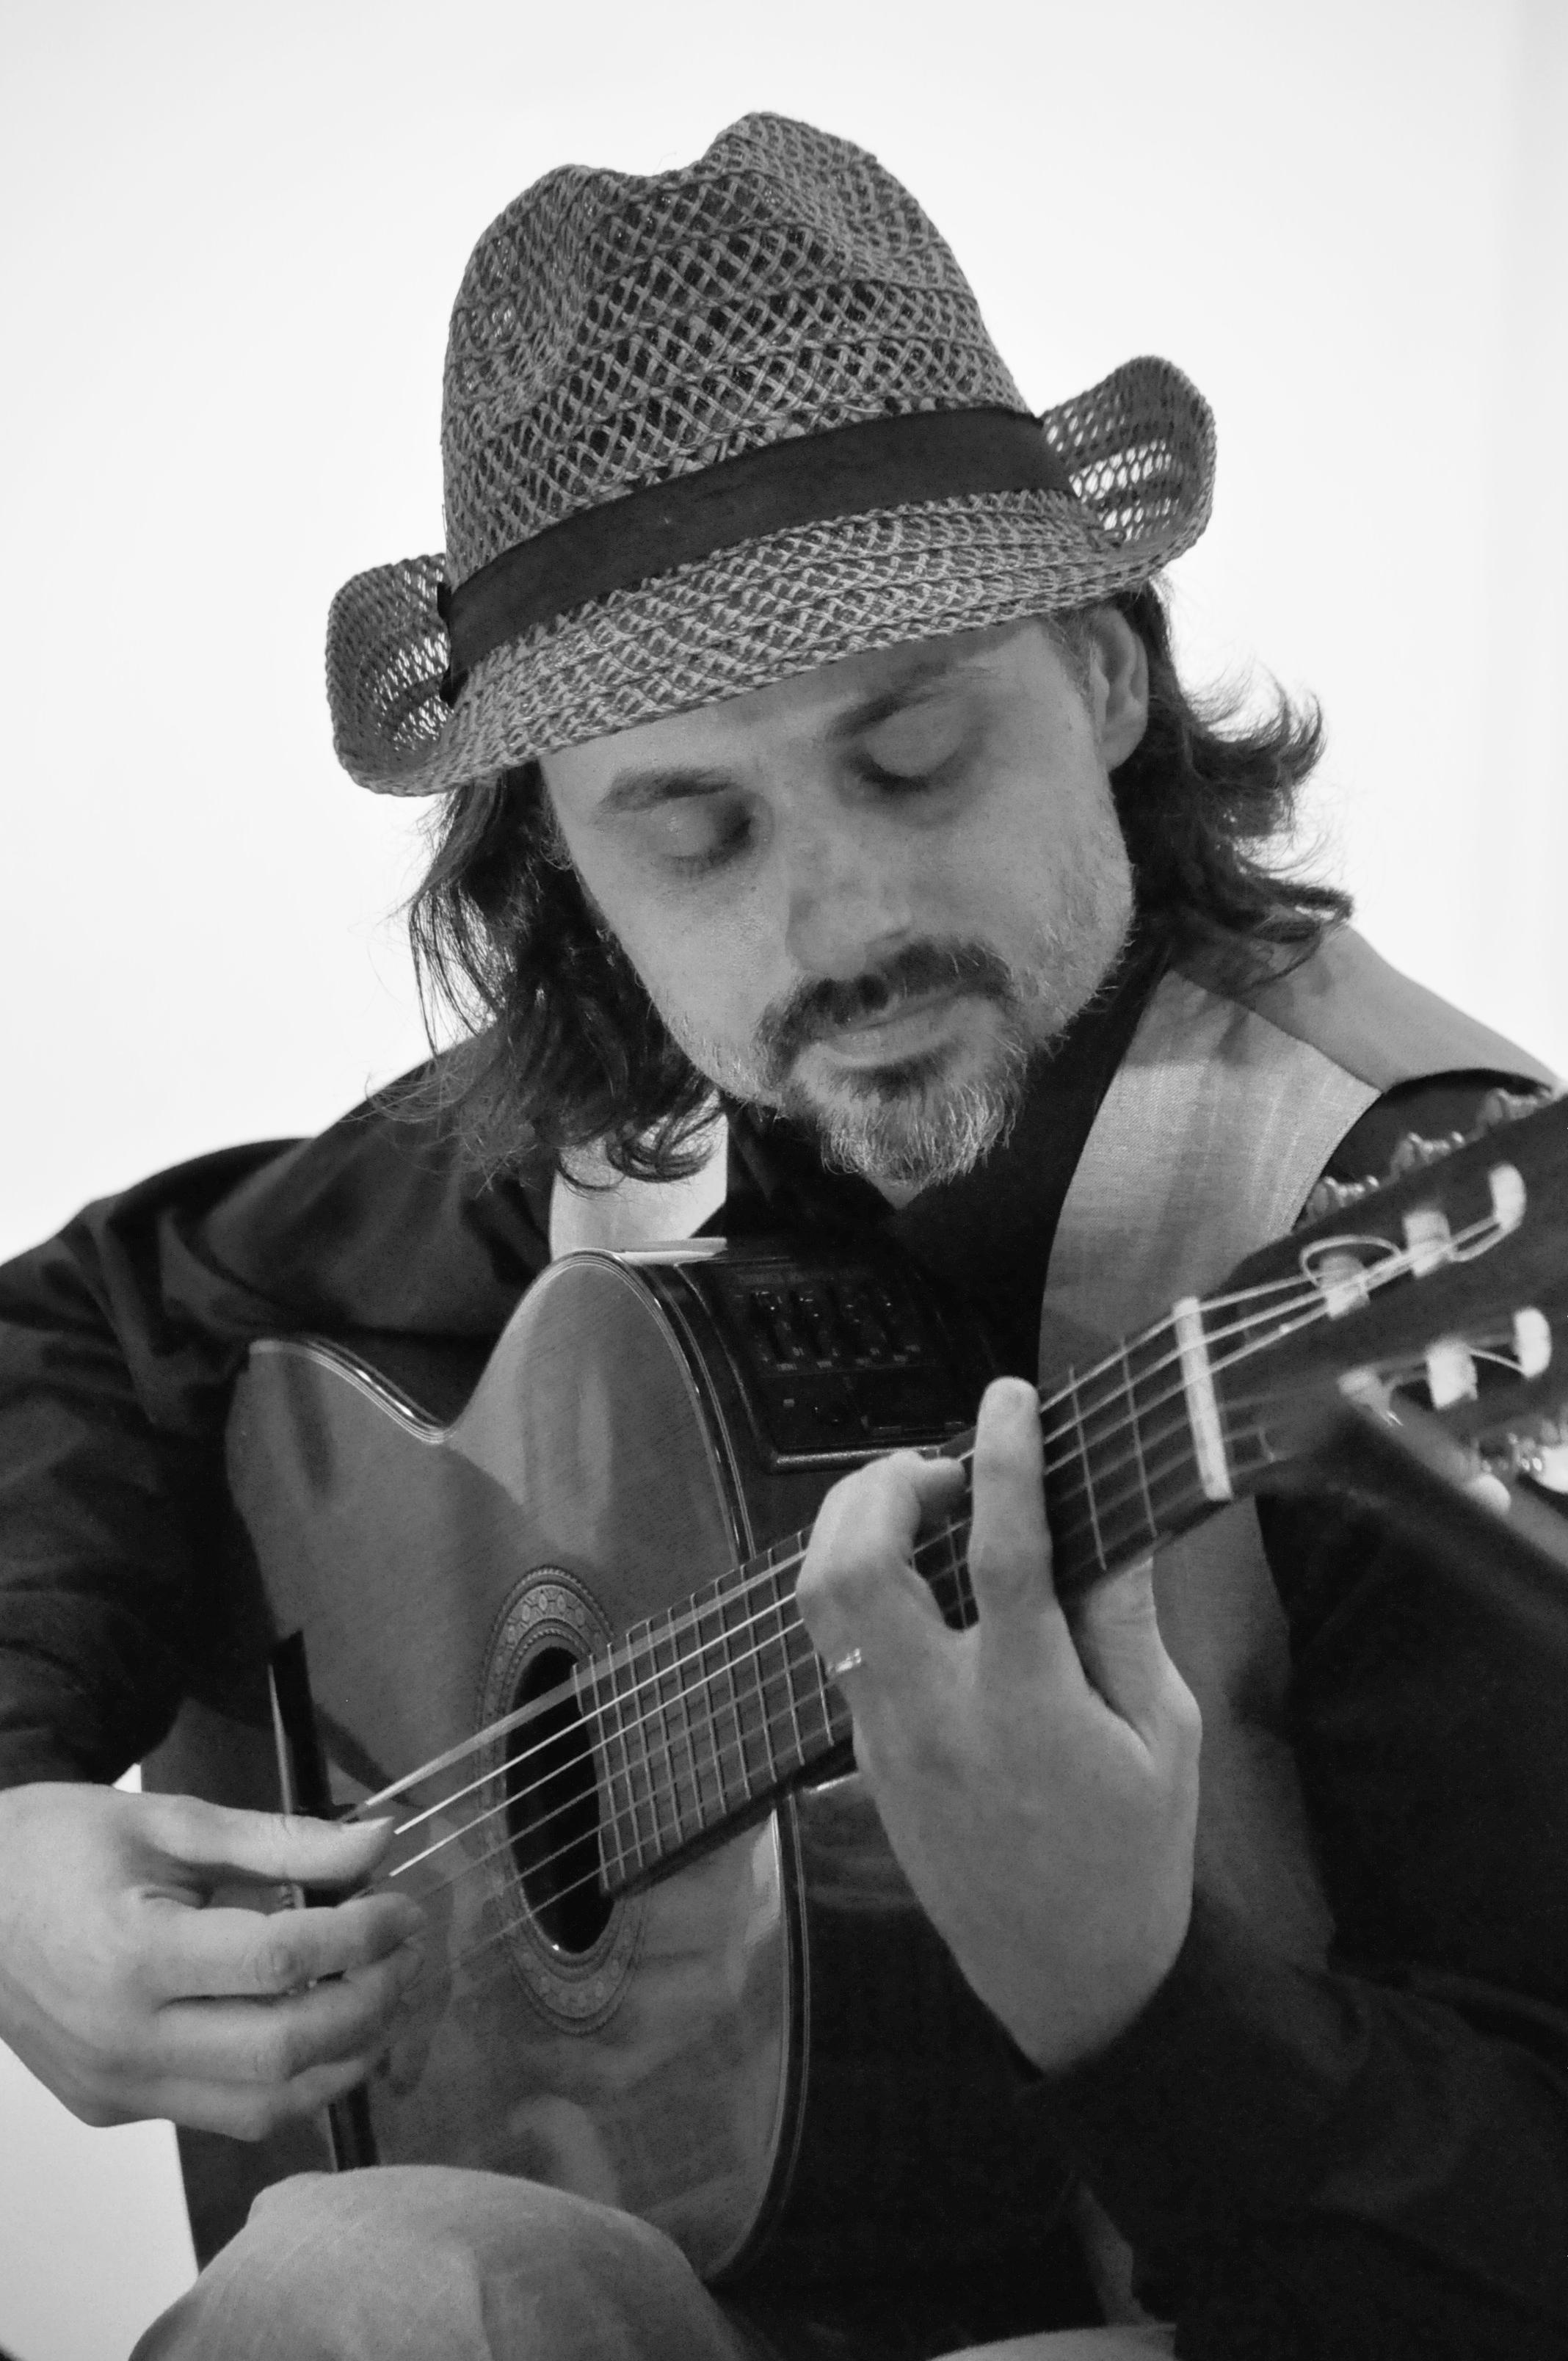 Marcus Bonilla by Mariane Kerbes